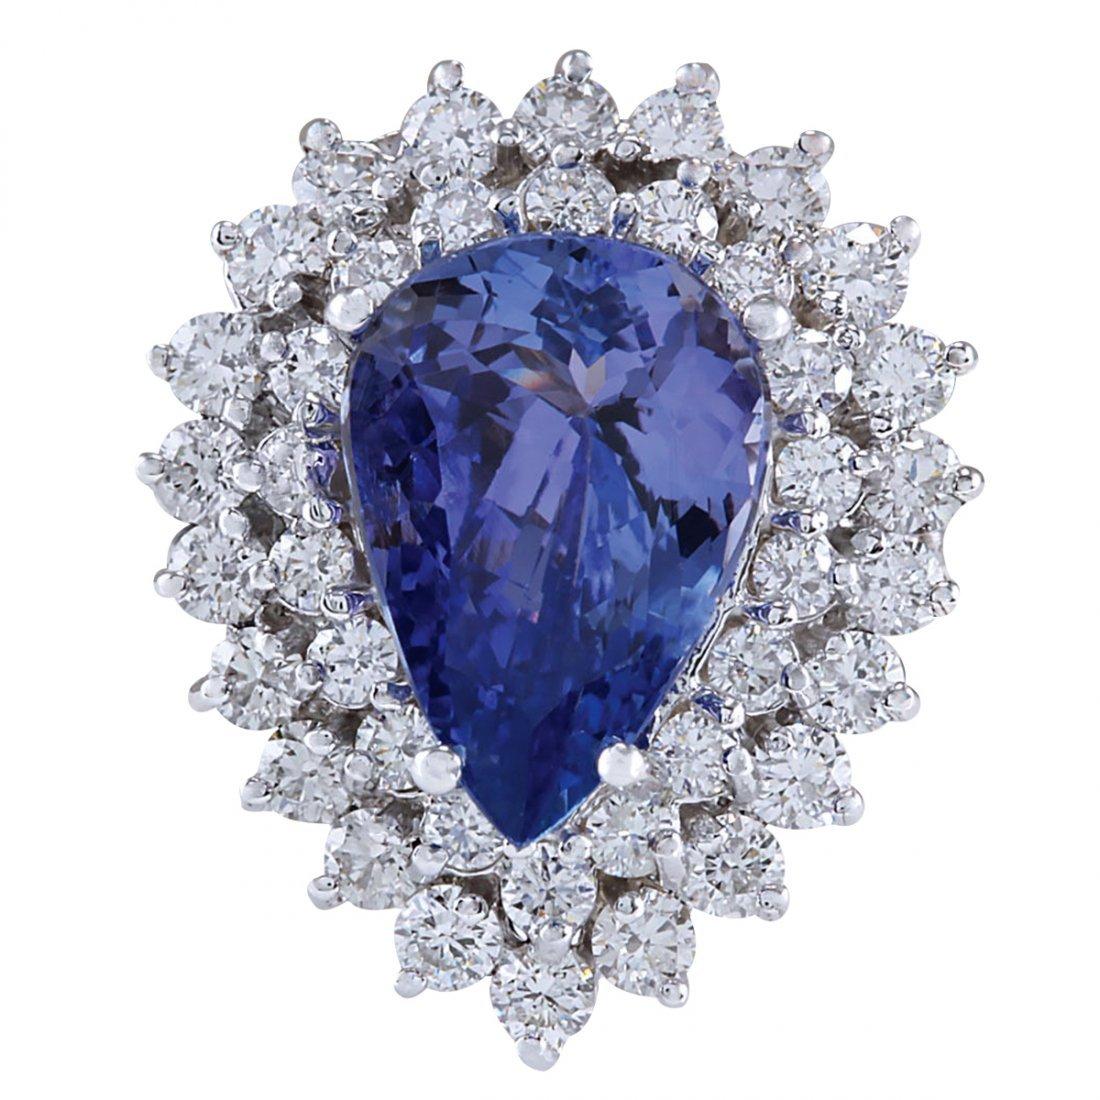 5.75CTW Natural Tanzanite And Diamond Ring In 14K White